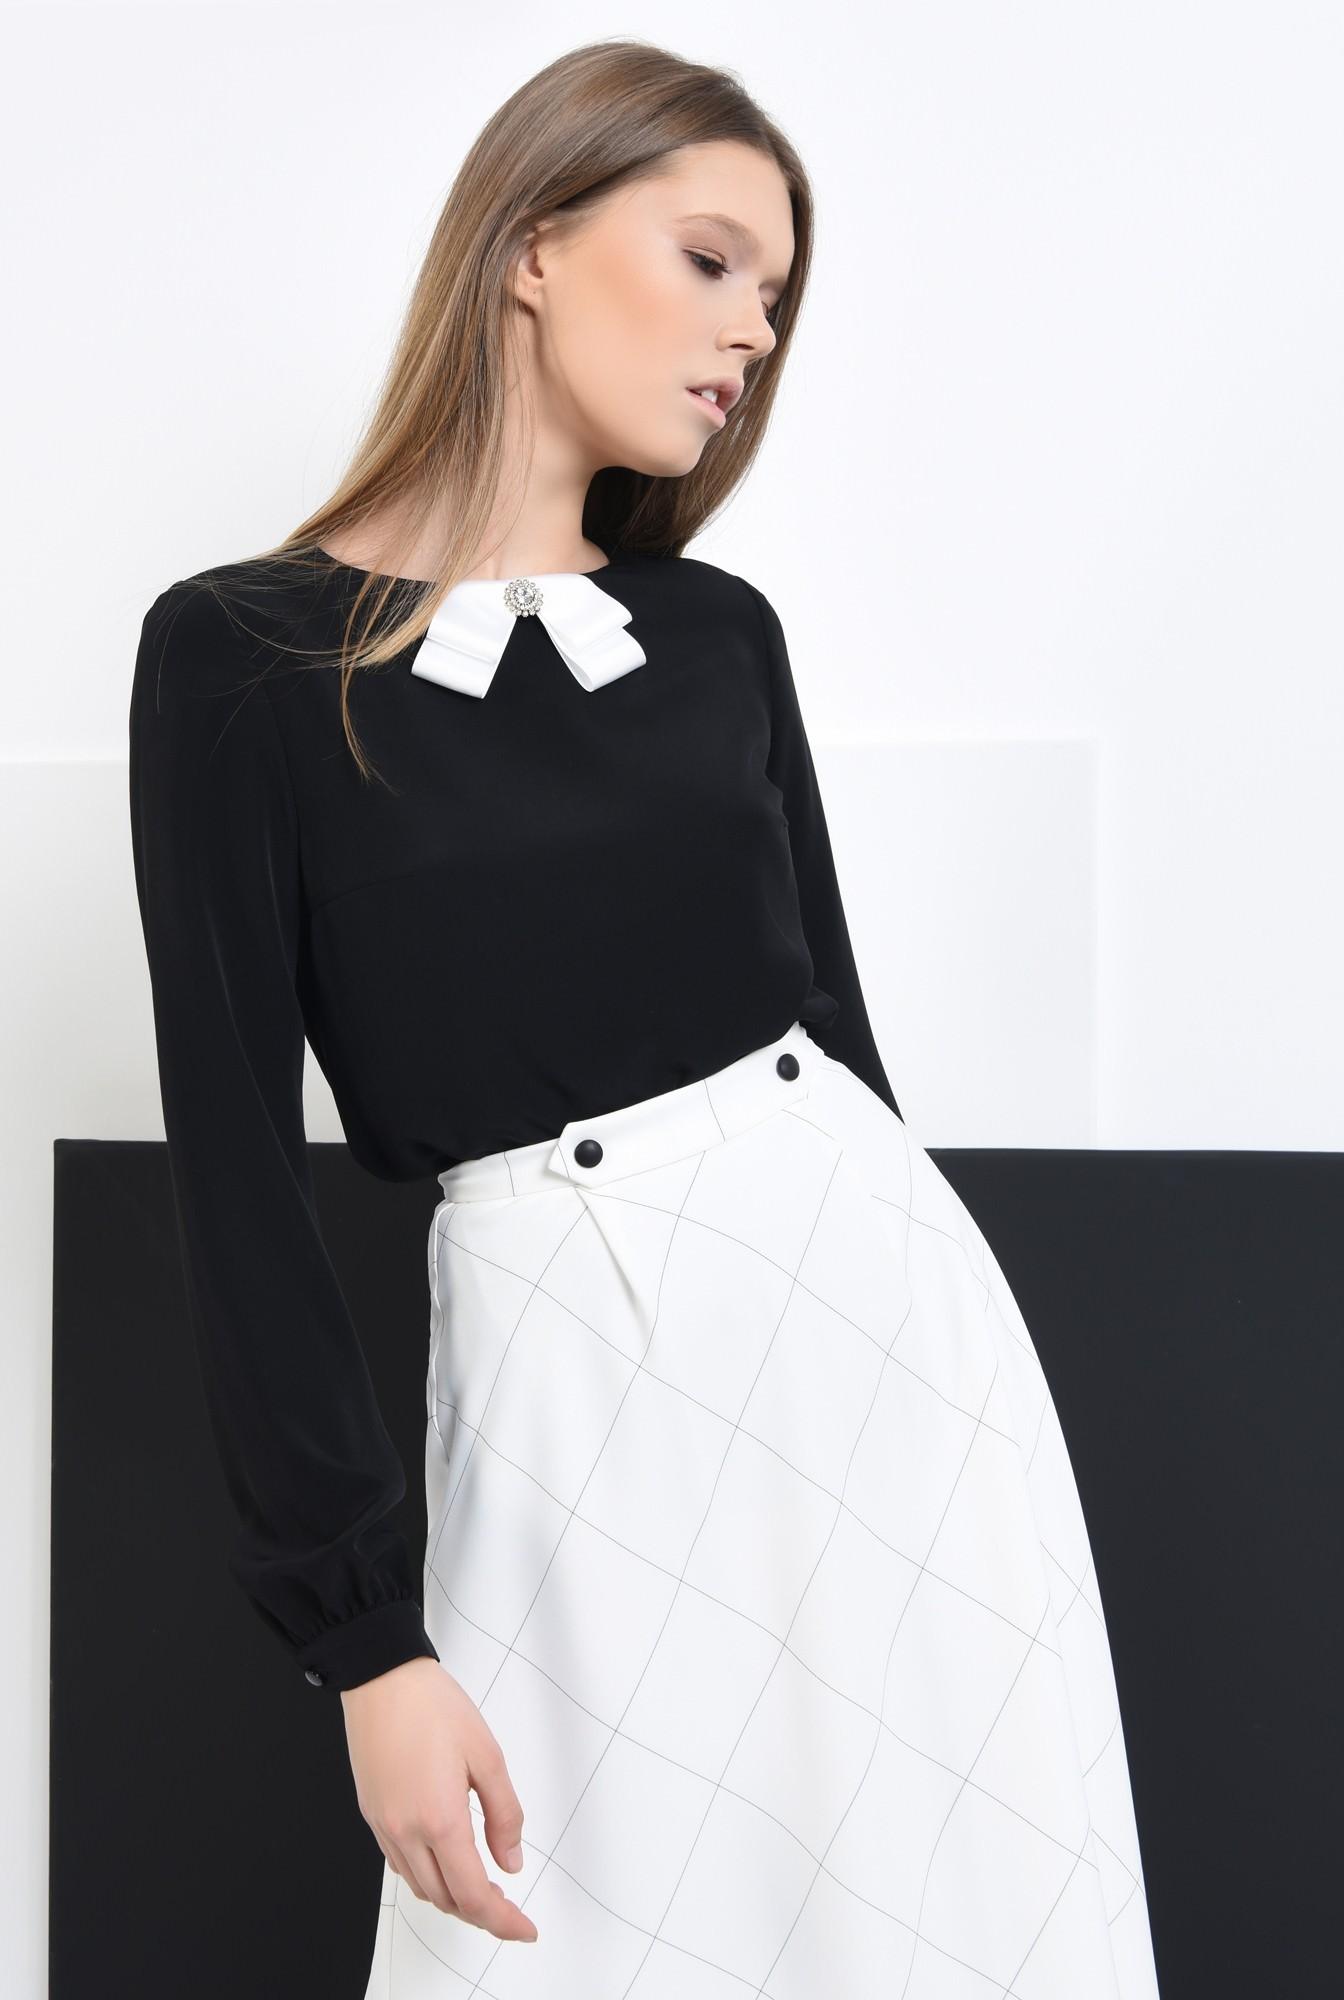 0 - Bluza din sifon, contrast, maneci lungi